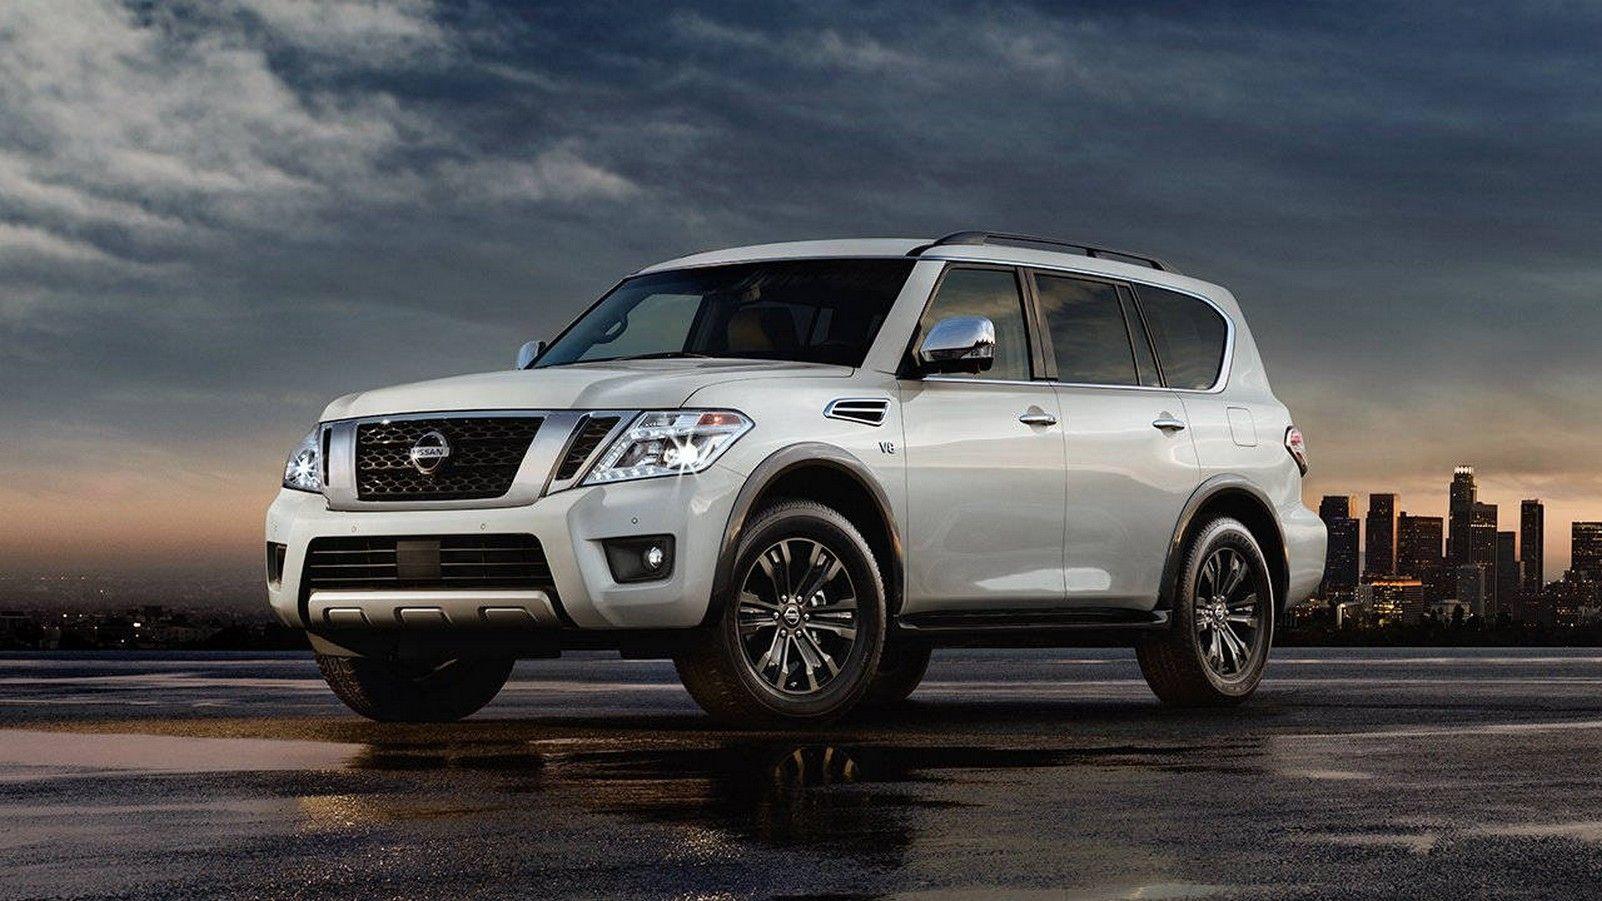 Nissan Armada 2020 >> 2020 Nissan Armada Pictures Cars And Trucks Pinterest Nissan